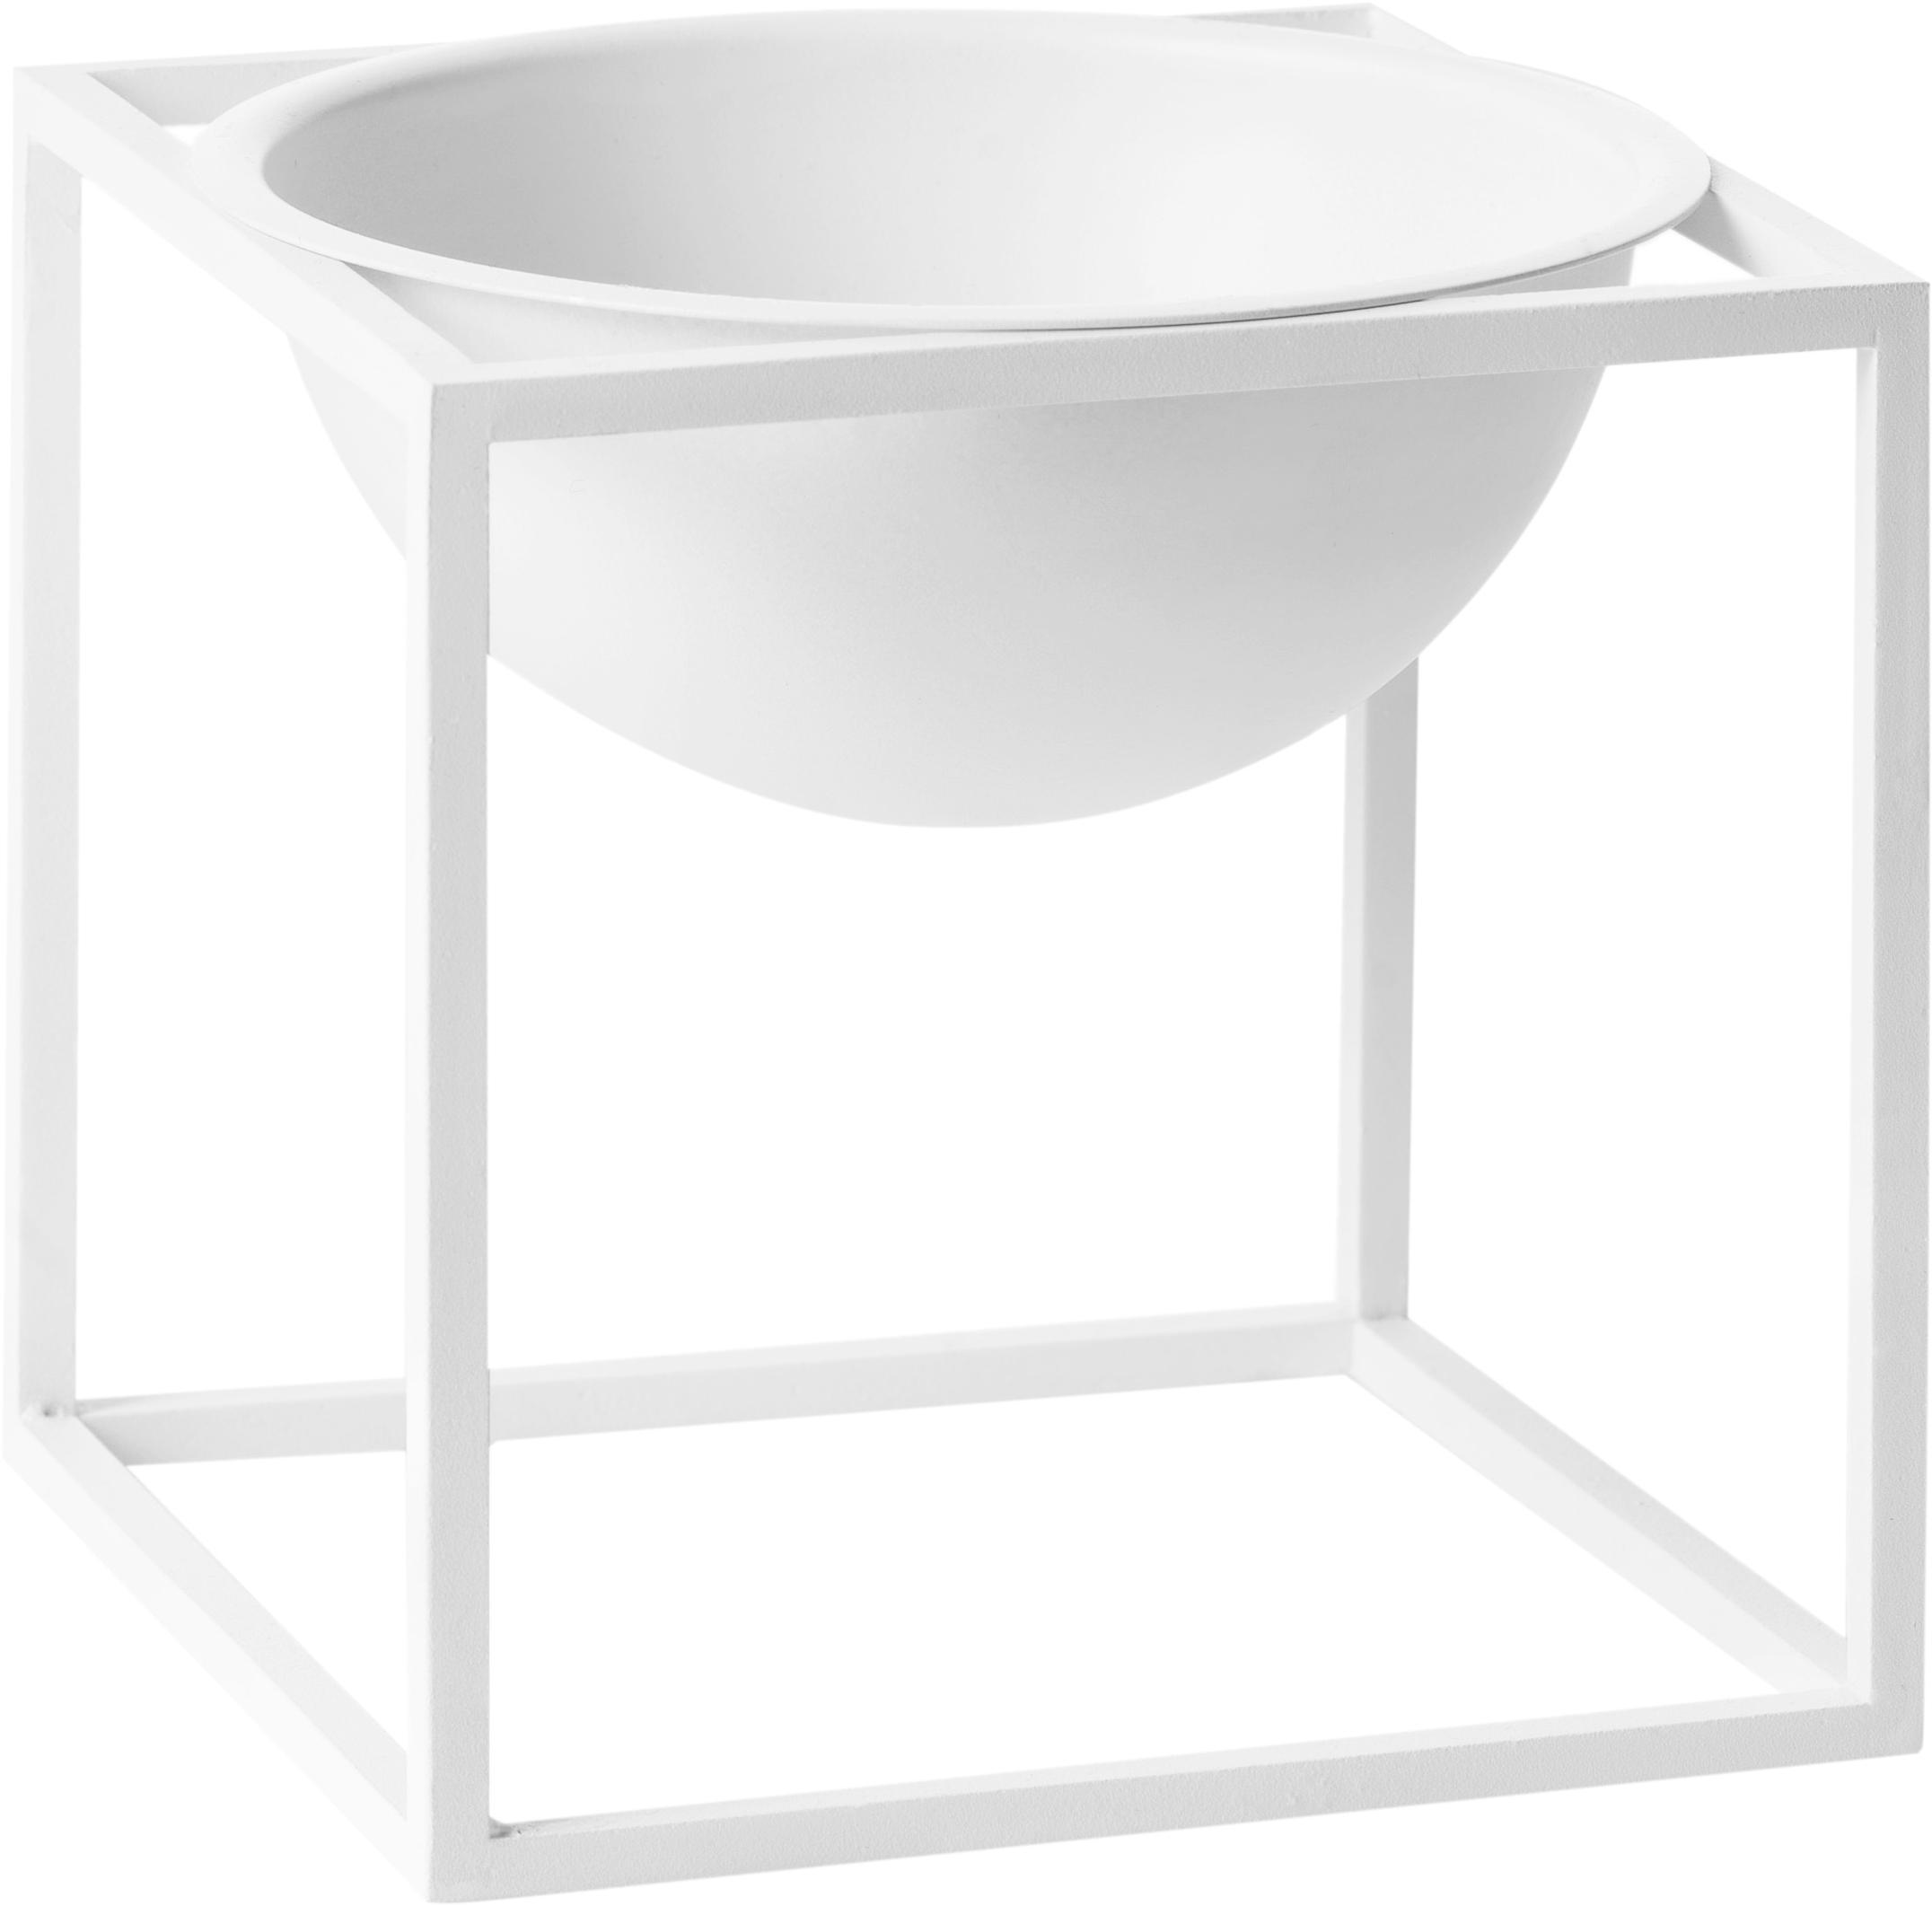 Ciotola Kubus, Acciaio verniciato, Bianco, L 14 x A 14 cm